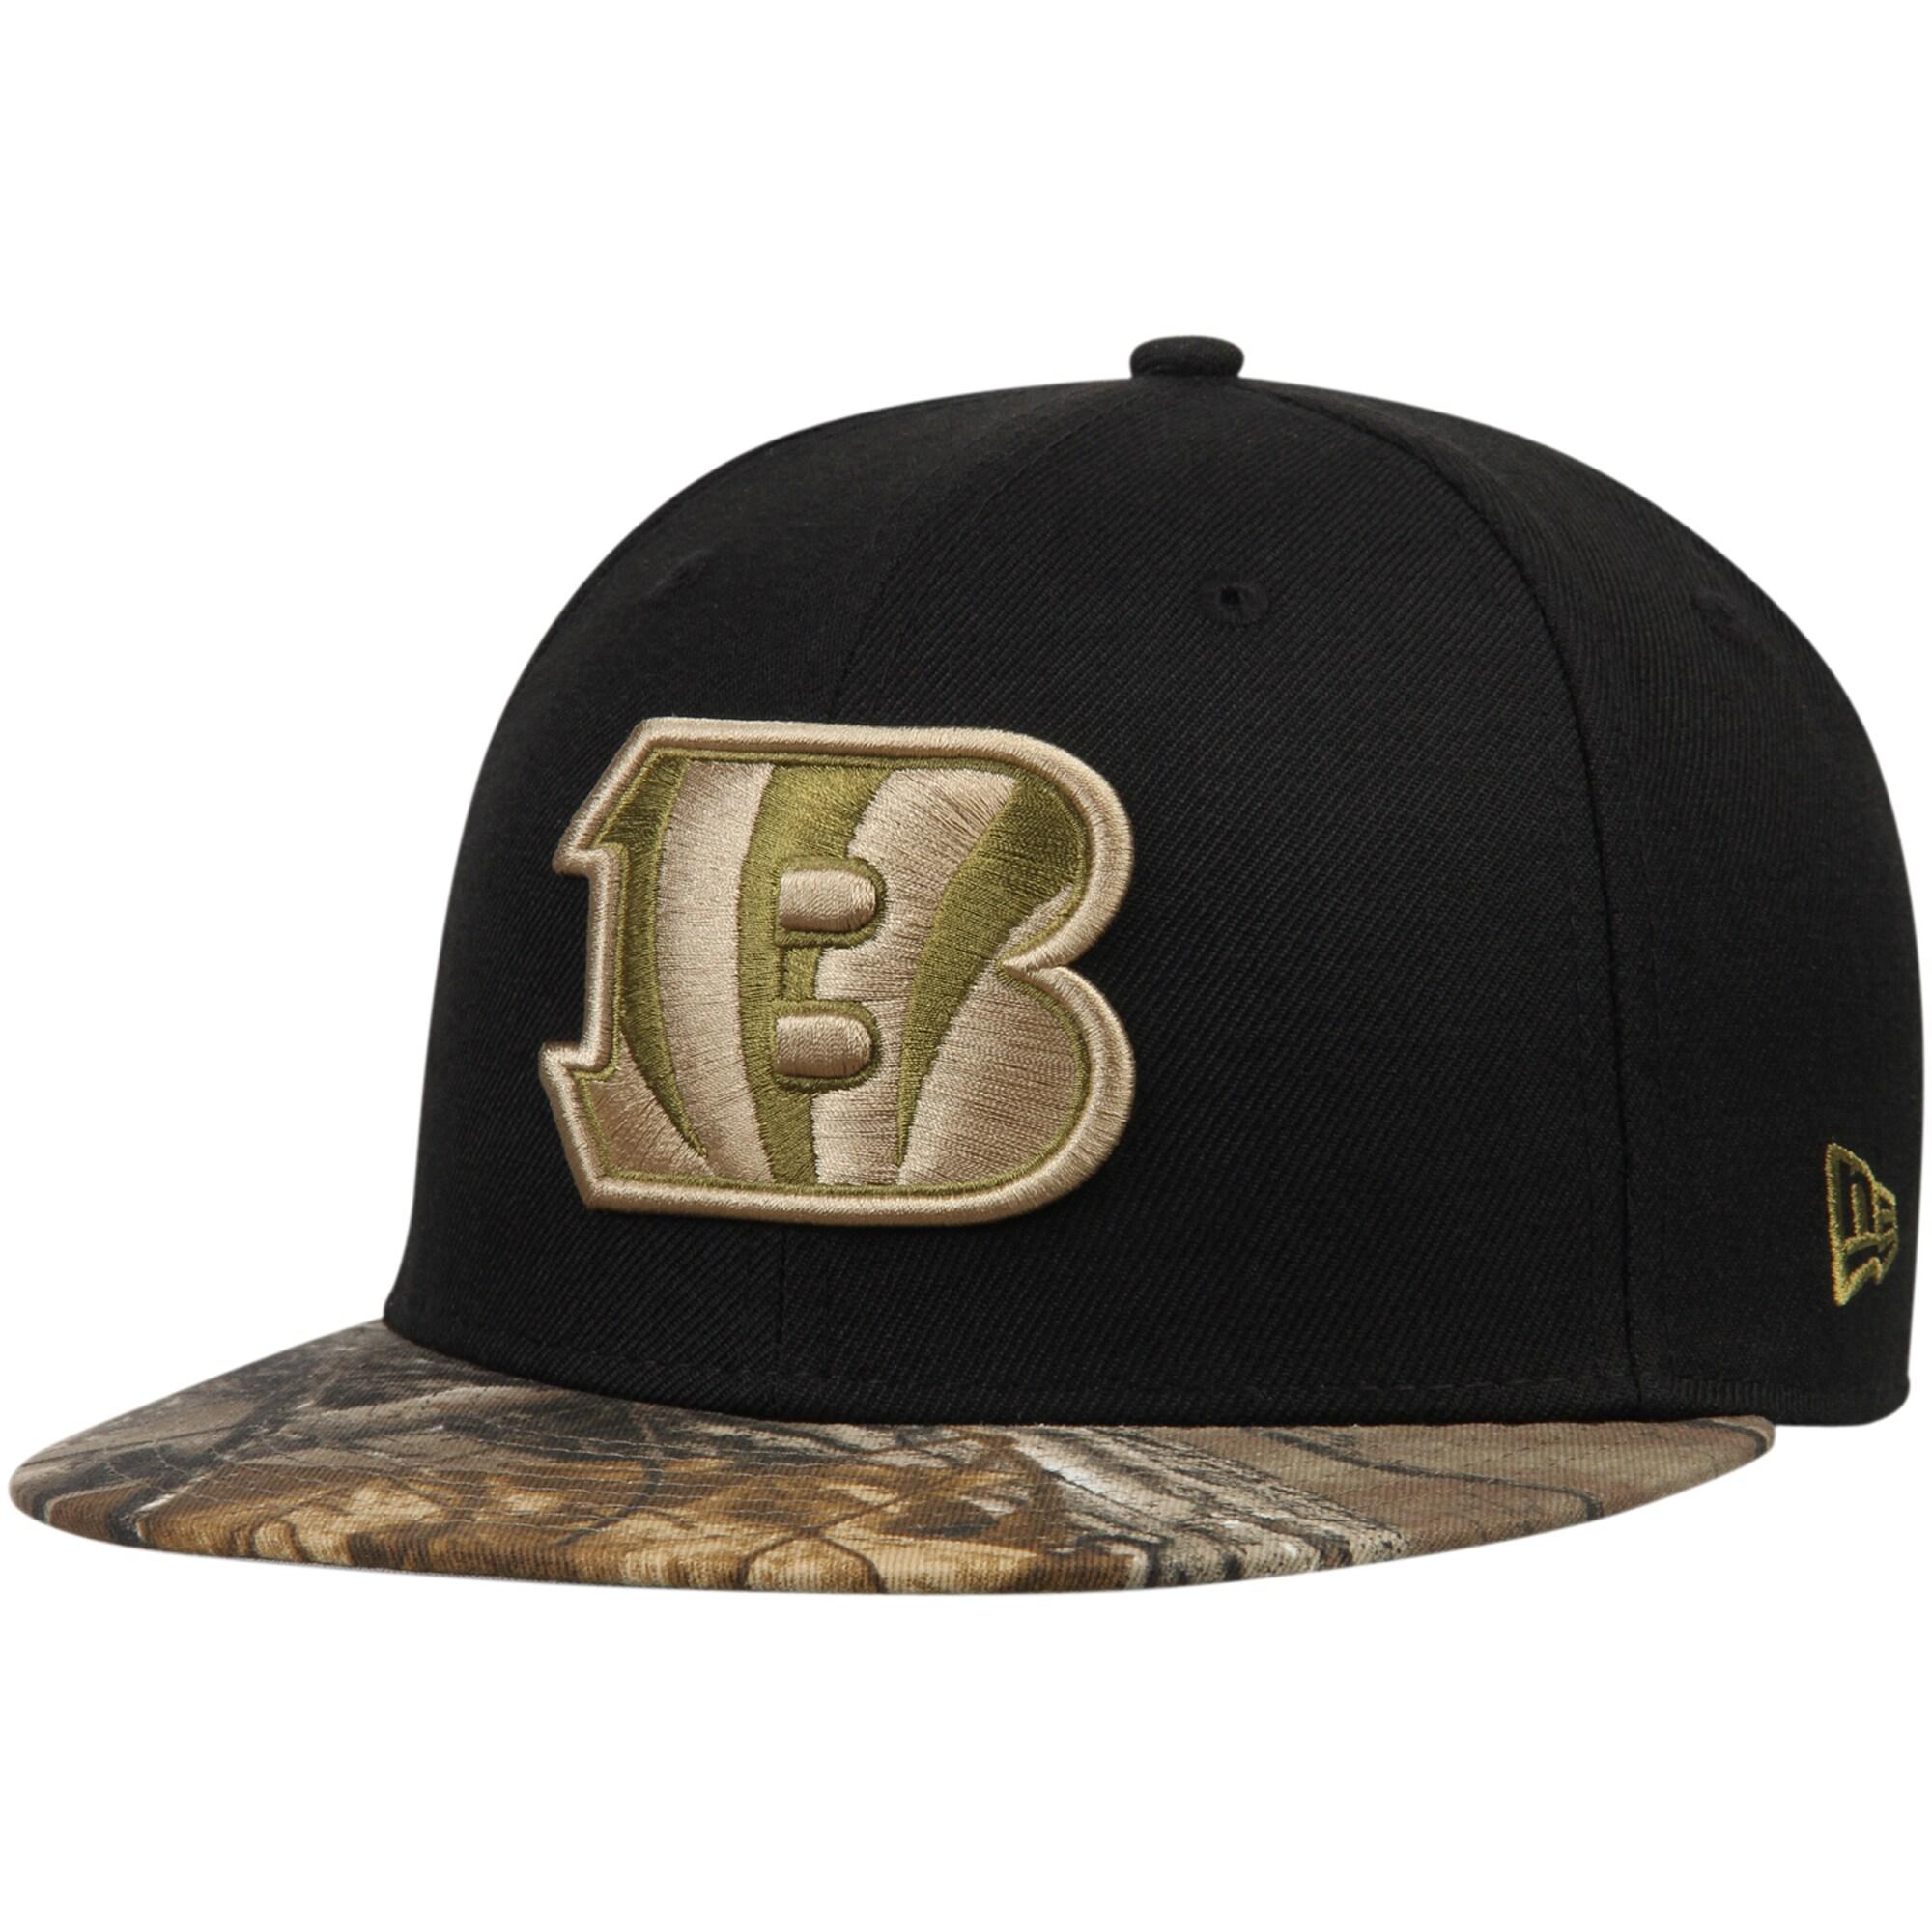 Cincinnati Bengals New Era Rambo 59FIFTY Fitted Hat - Black/Realtree Camo